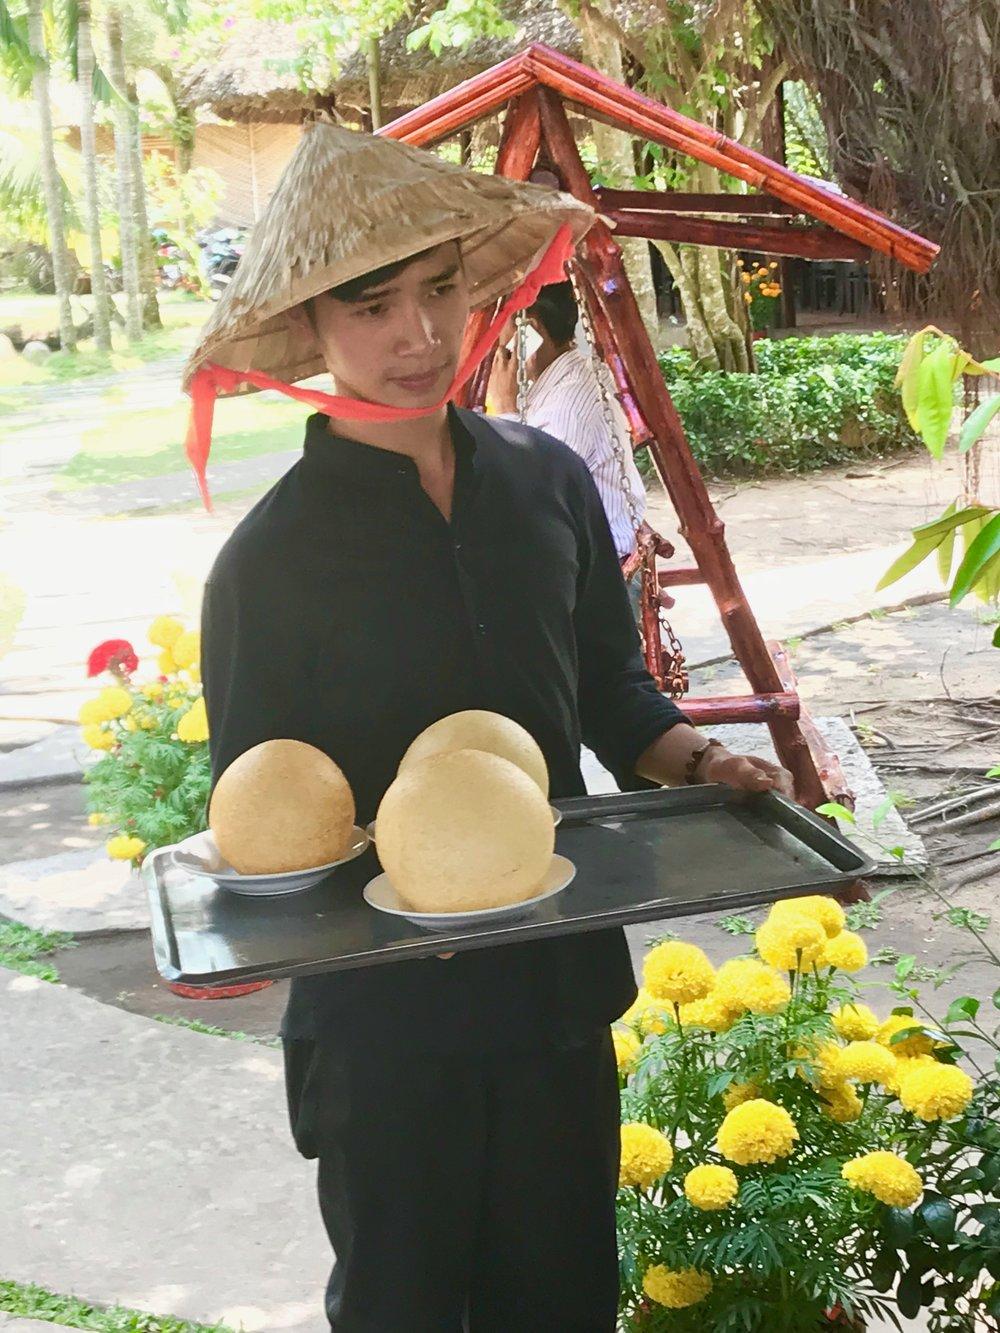 Waiter w Cone hat & globe sticky rice.jpg*.jpg